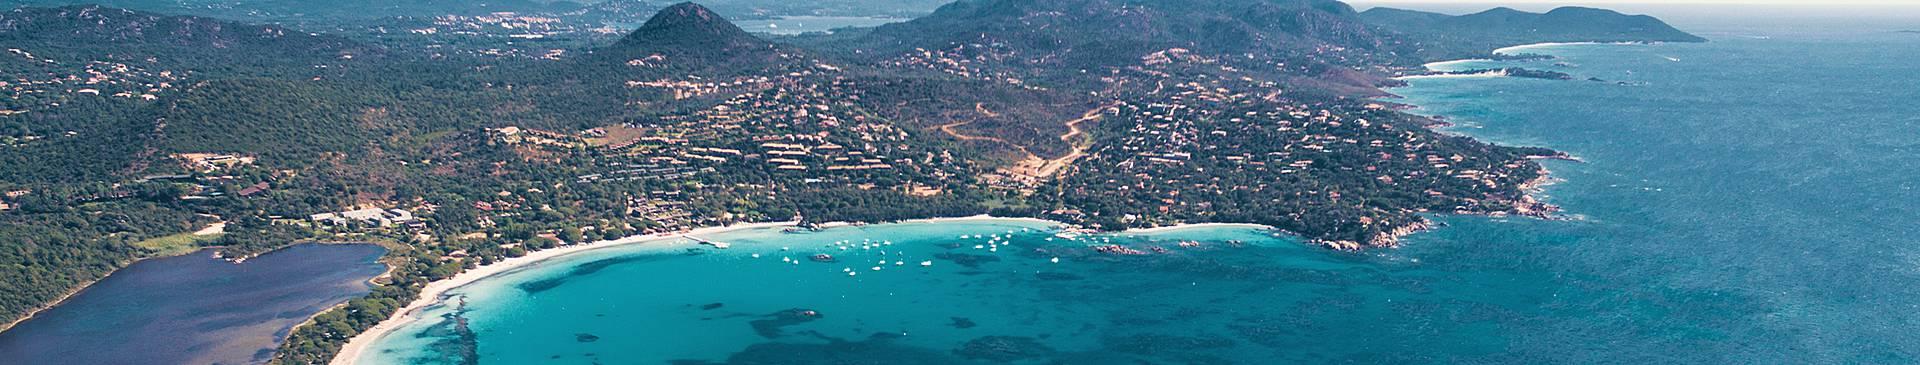 Strand und Meer Korsika Reisen